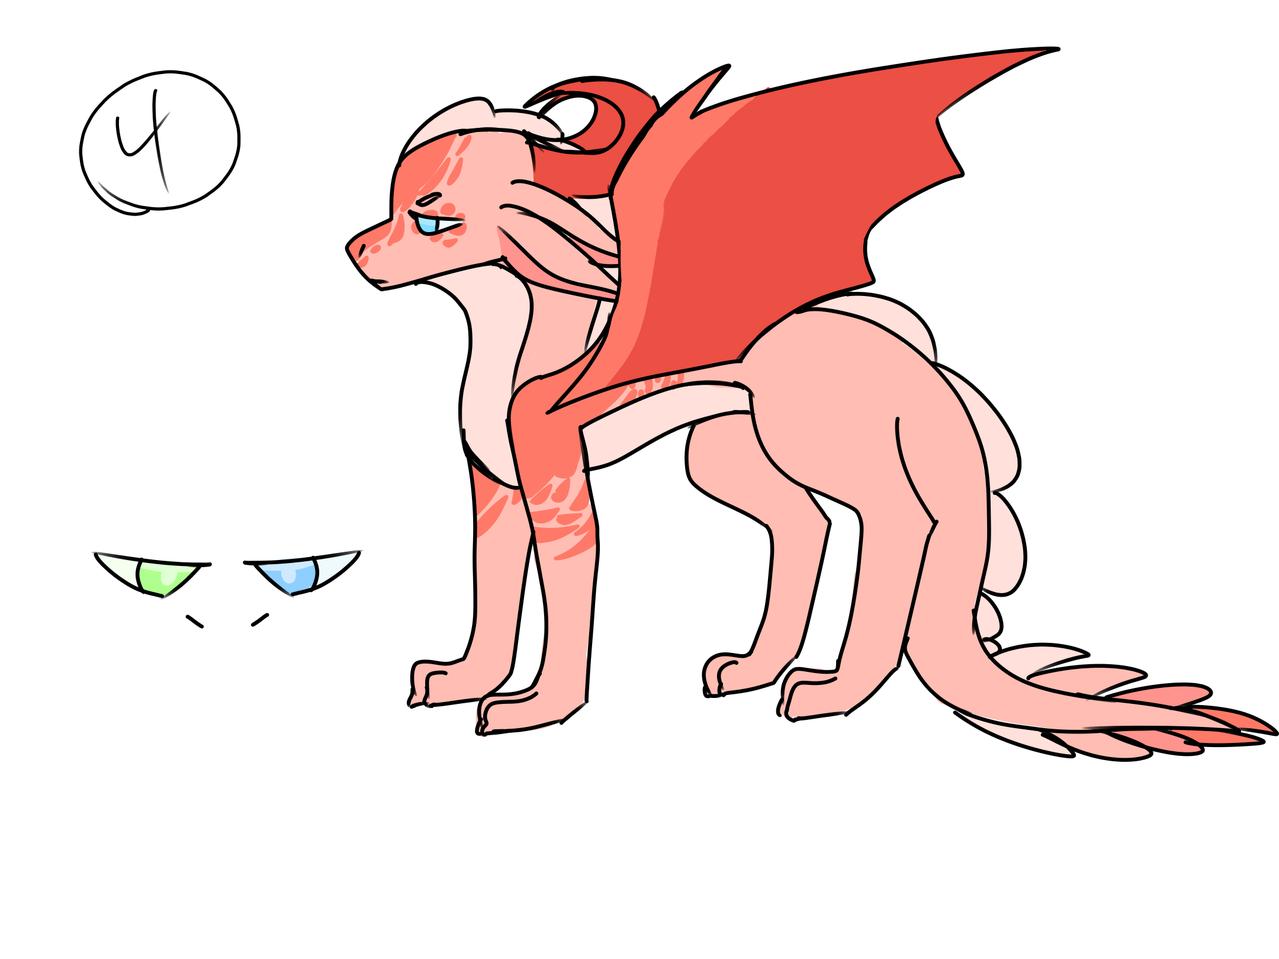 Adopts :) (desc) Illust of GhostTheBeast (Logan mode) Adopts